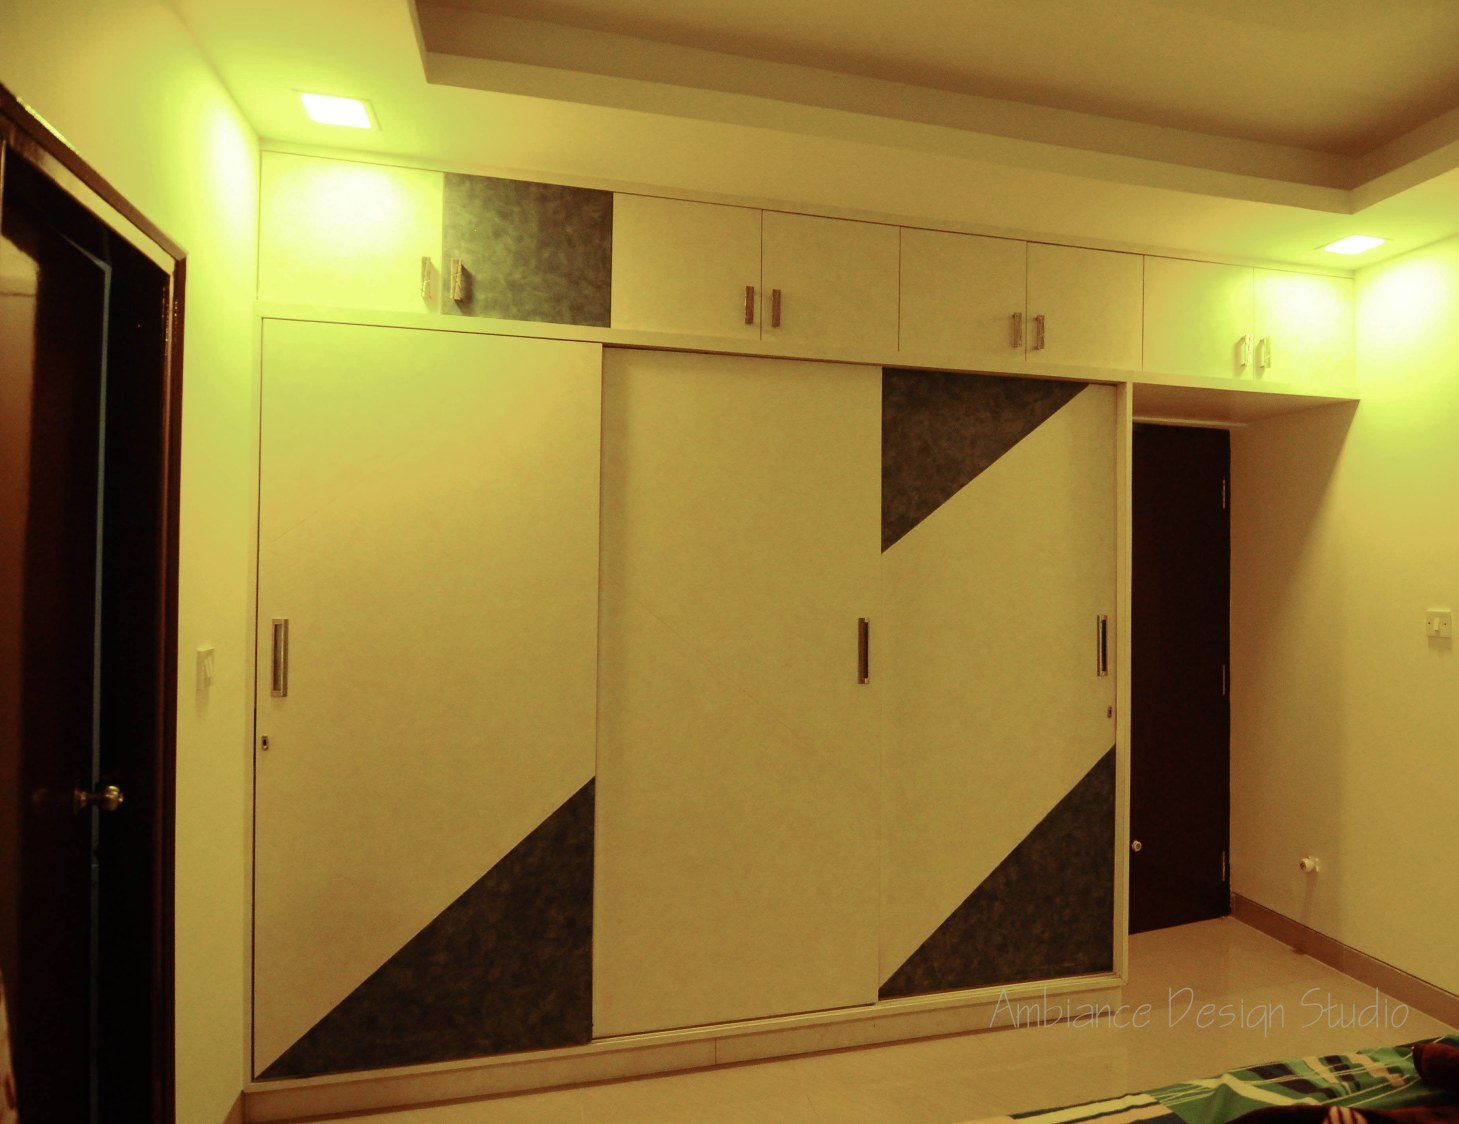 Sliding Wood Wardrobe with Edgy Designs by Manasa Bharadwaj Bedroom Modern | Interior Design Photos & Ideas